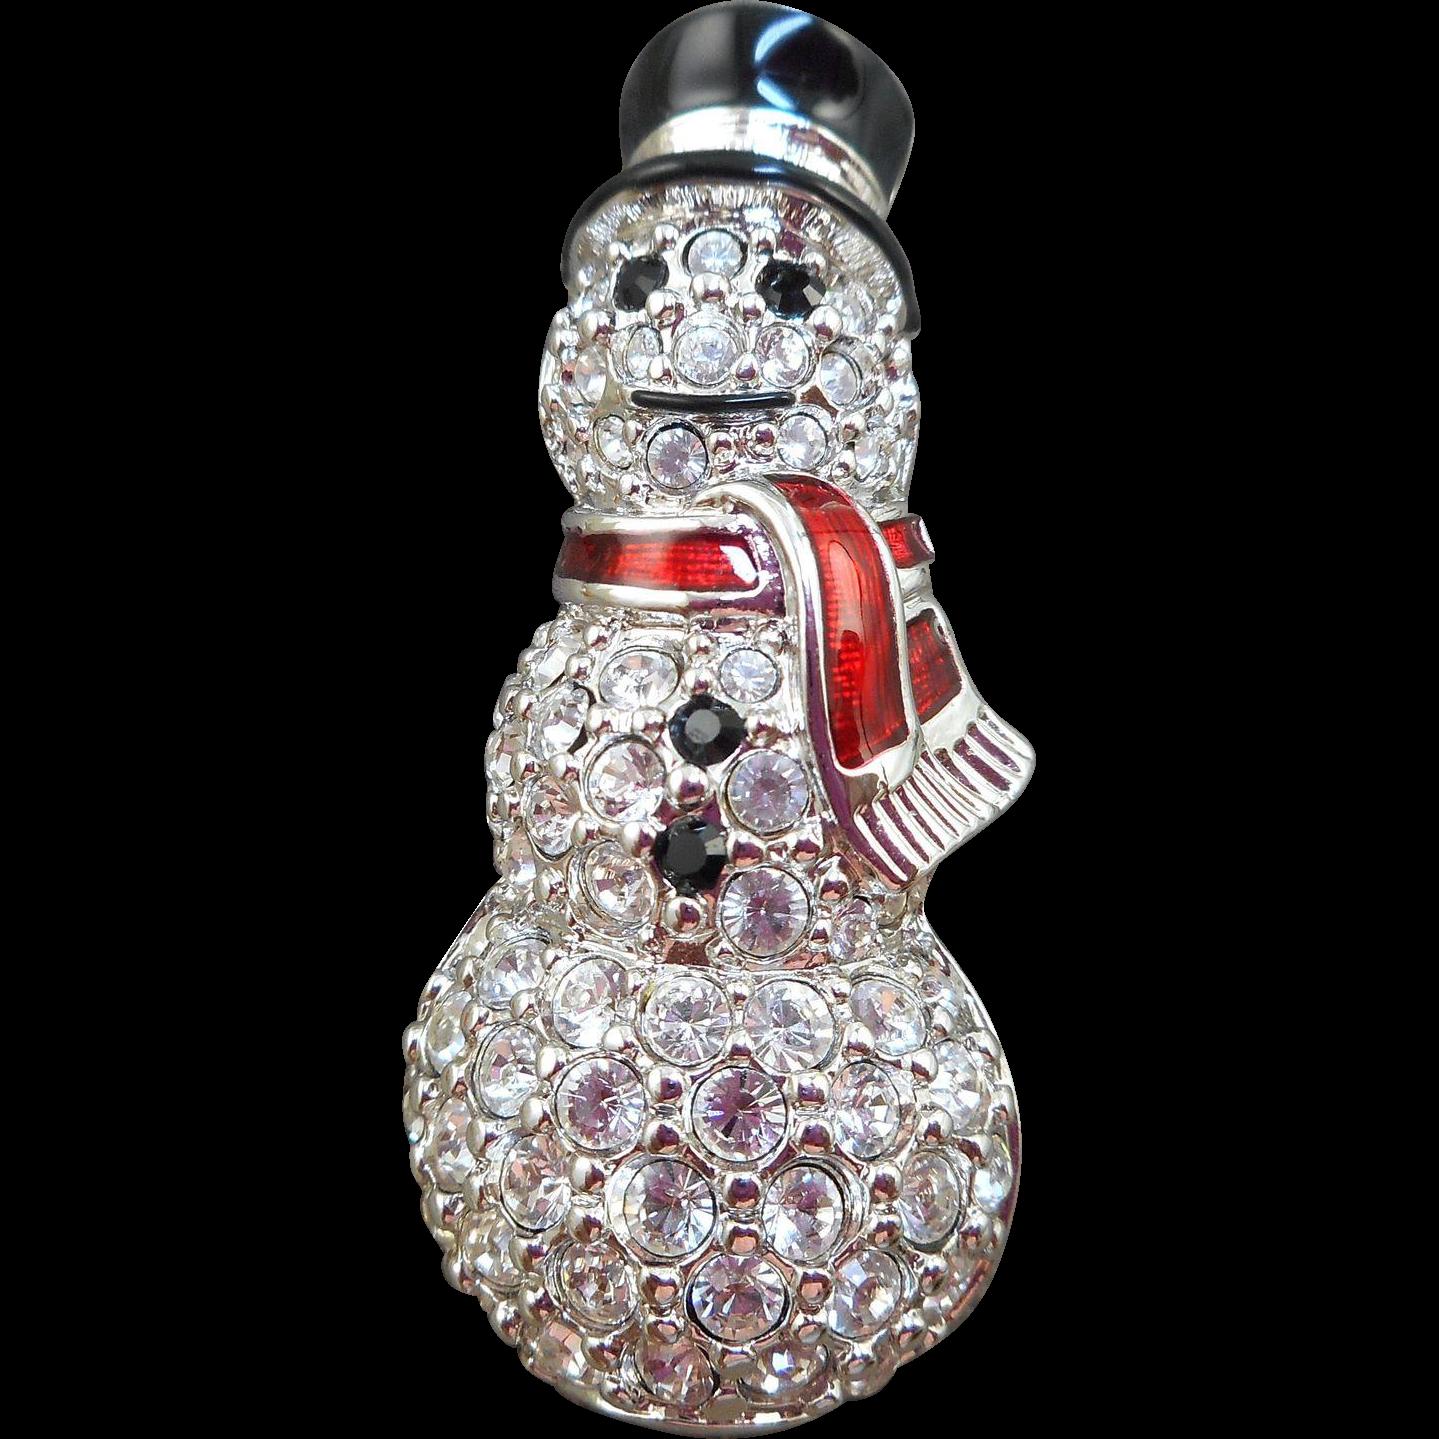 Swarovski Snowman Brooch